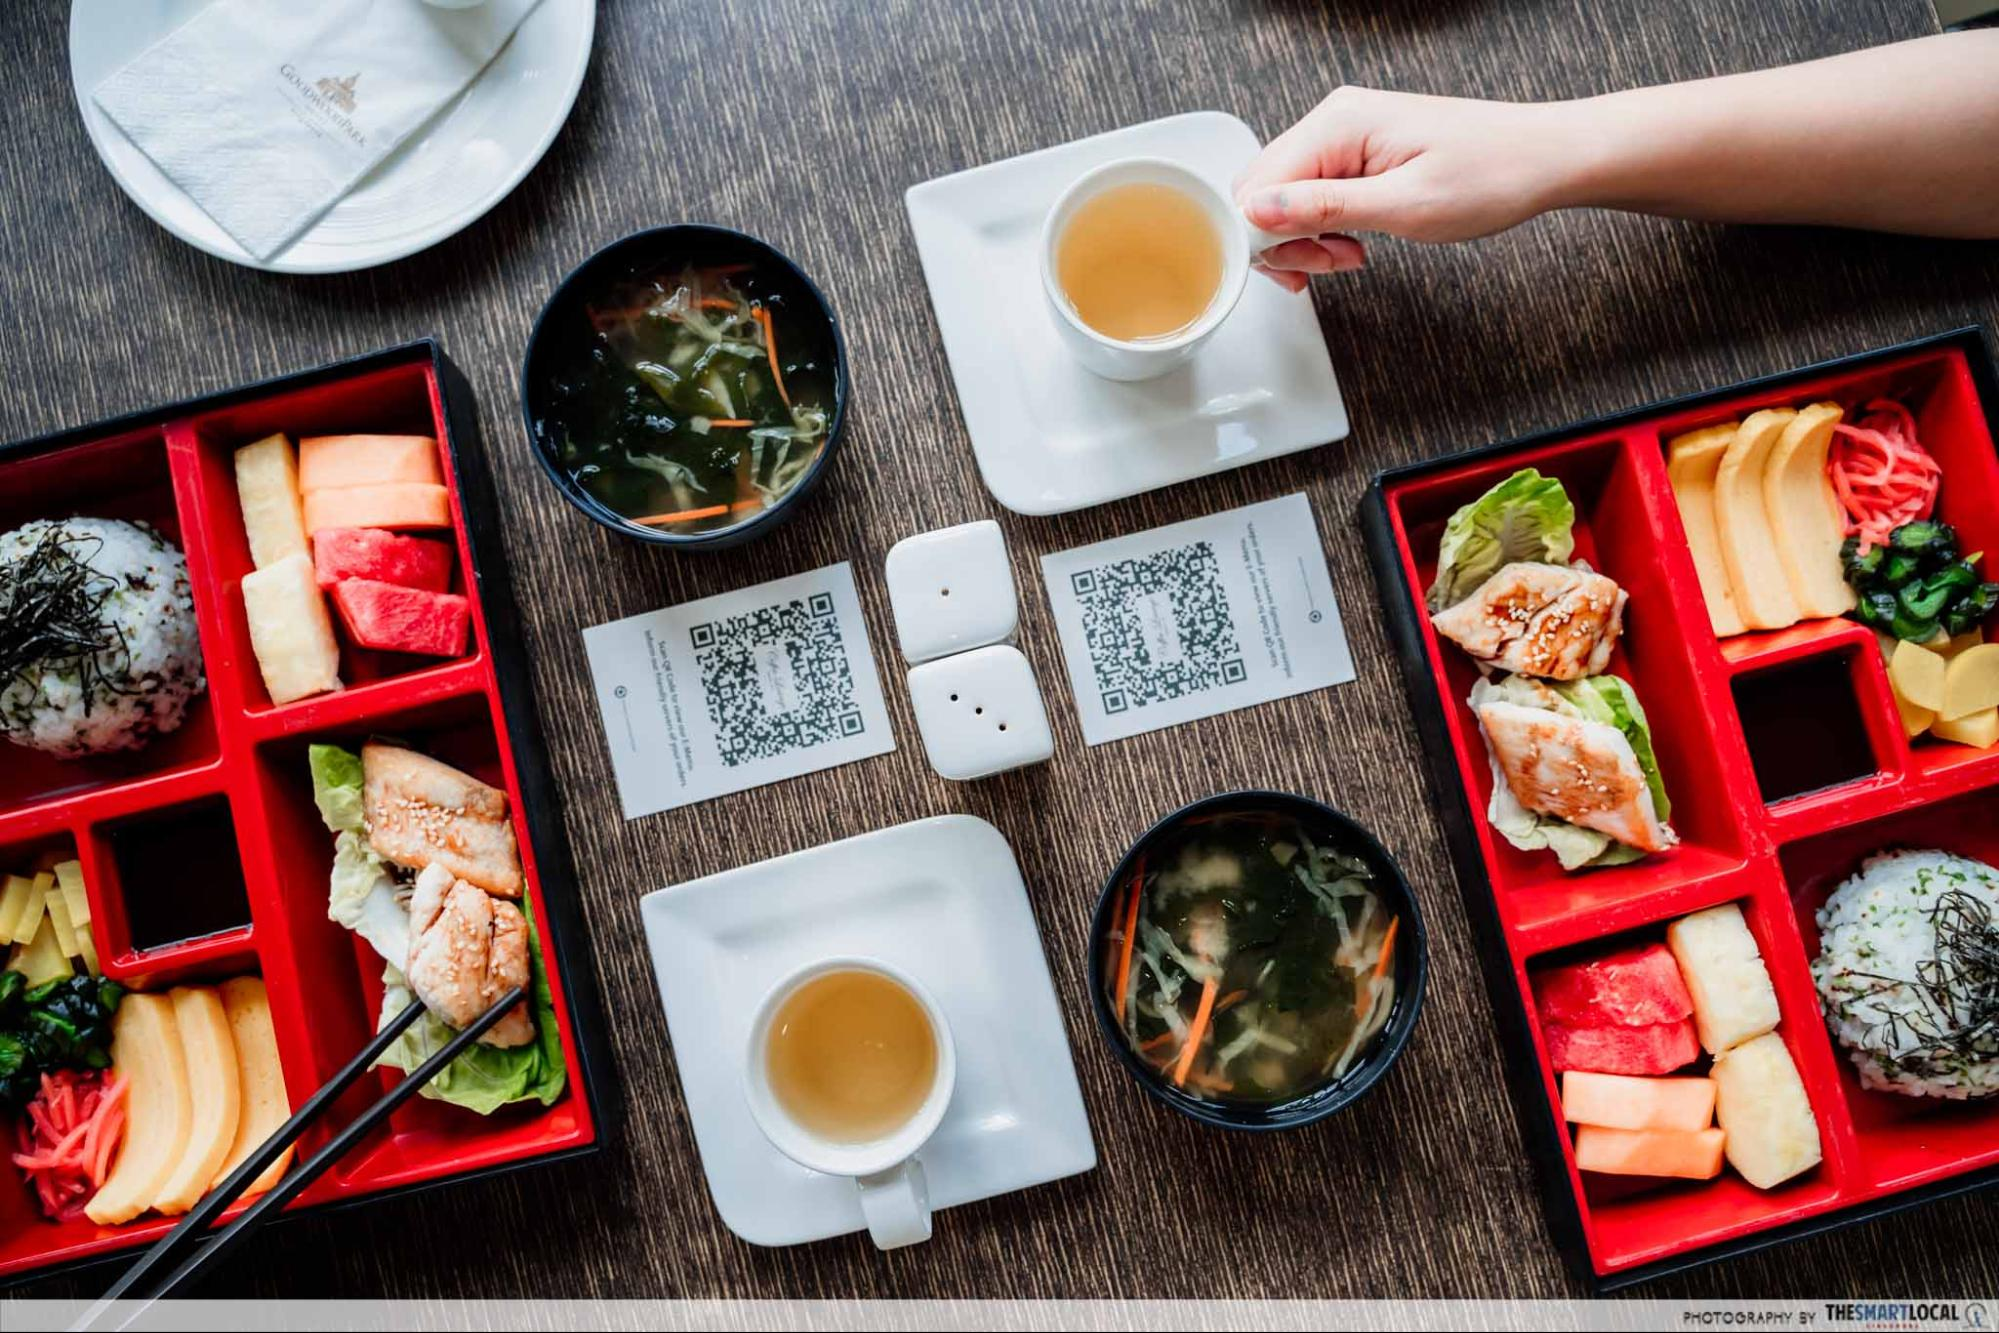 Coffee Lounge Japanese Bento Complimentary Breakfast